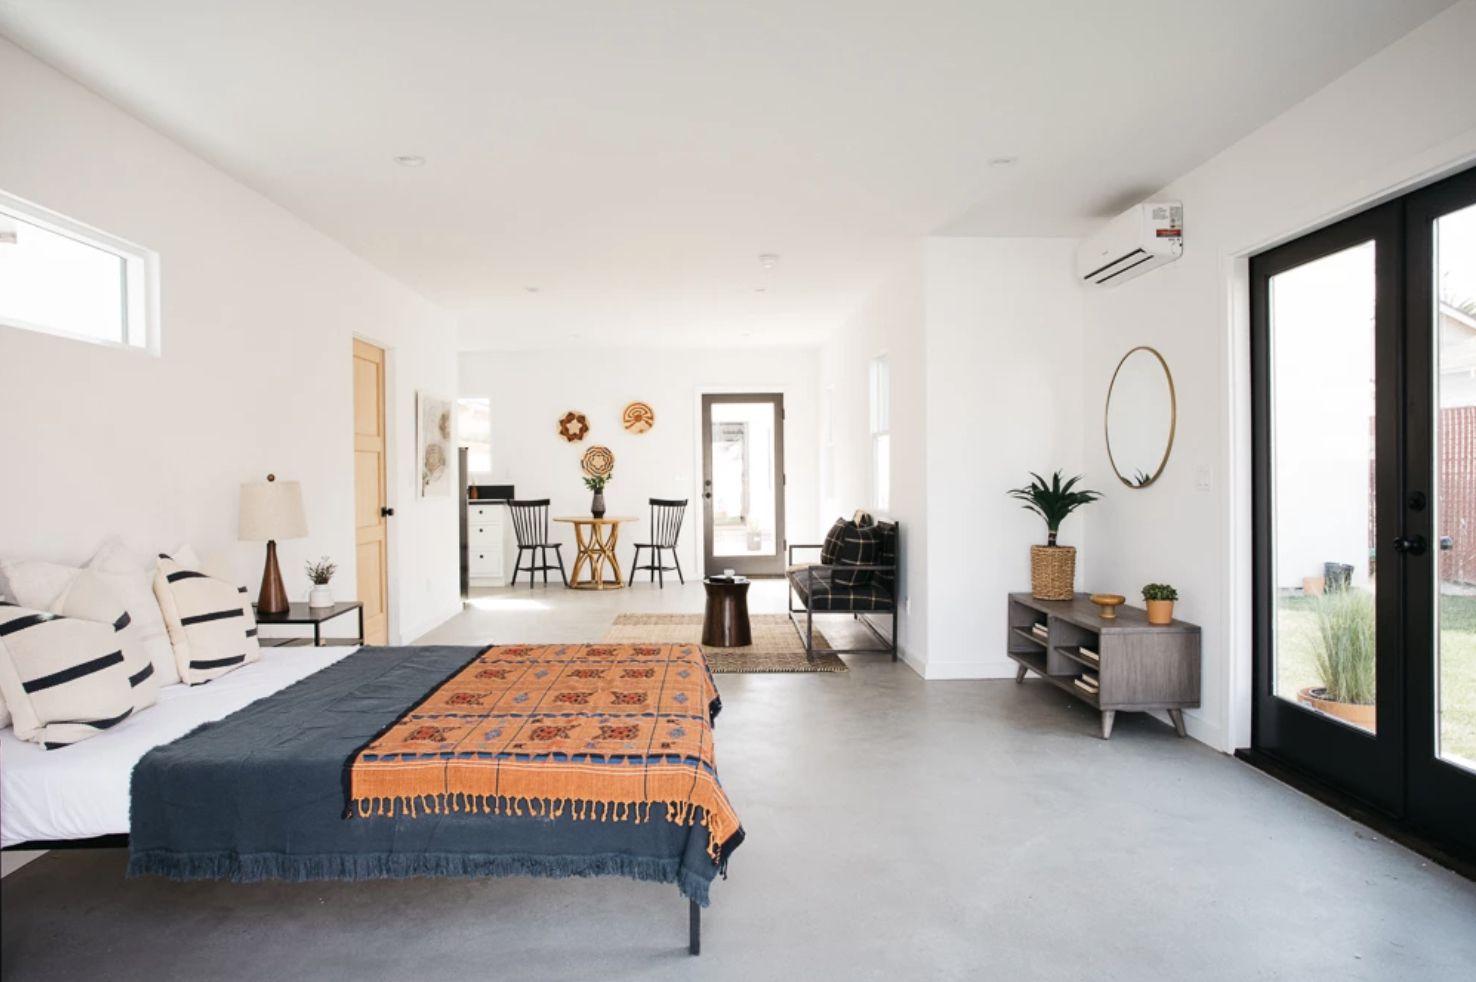 bedroom with open layout, navy blue bedspread, concrete floor, natural light